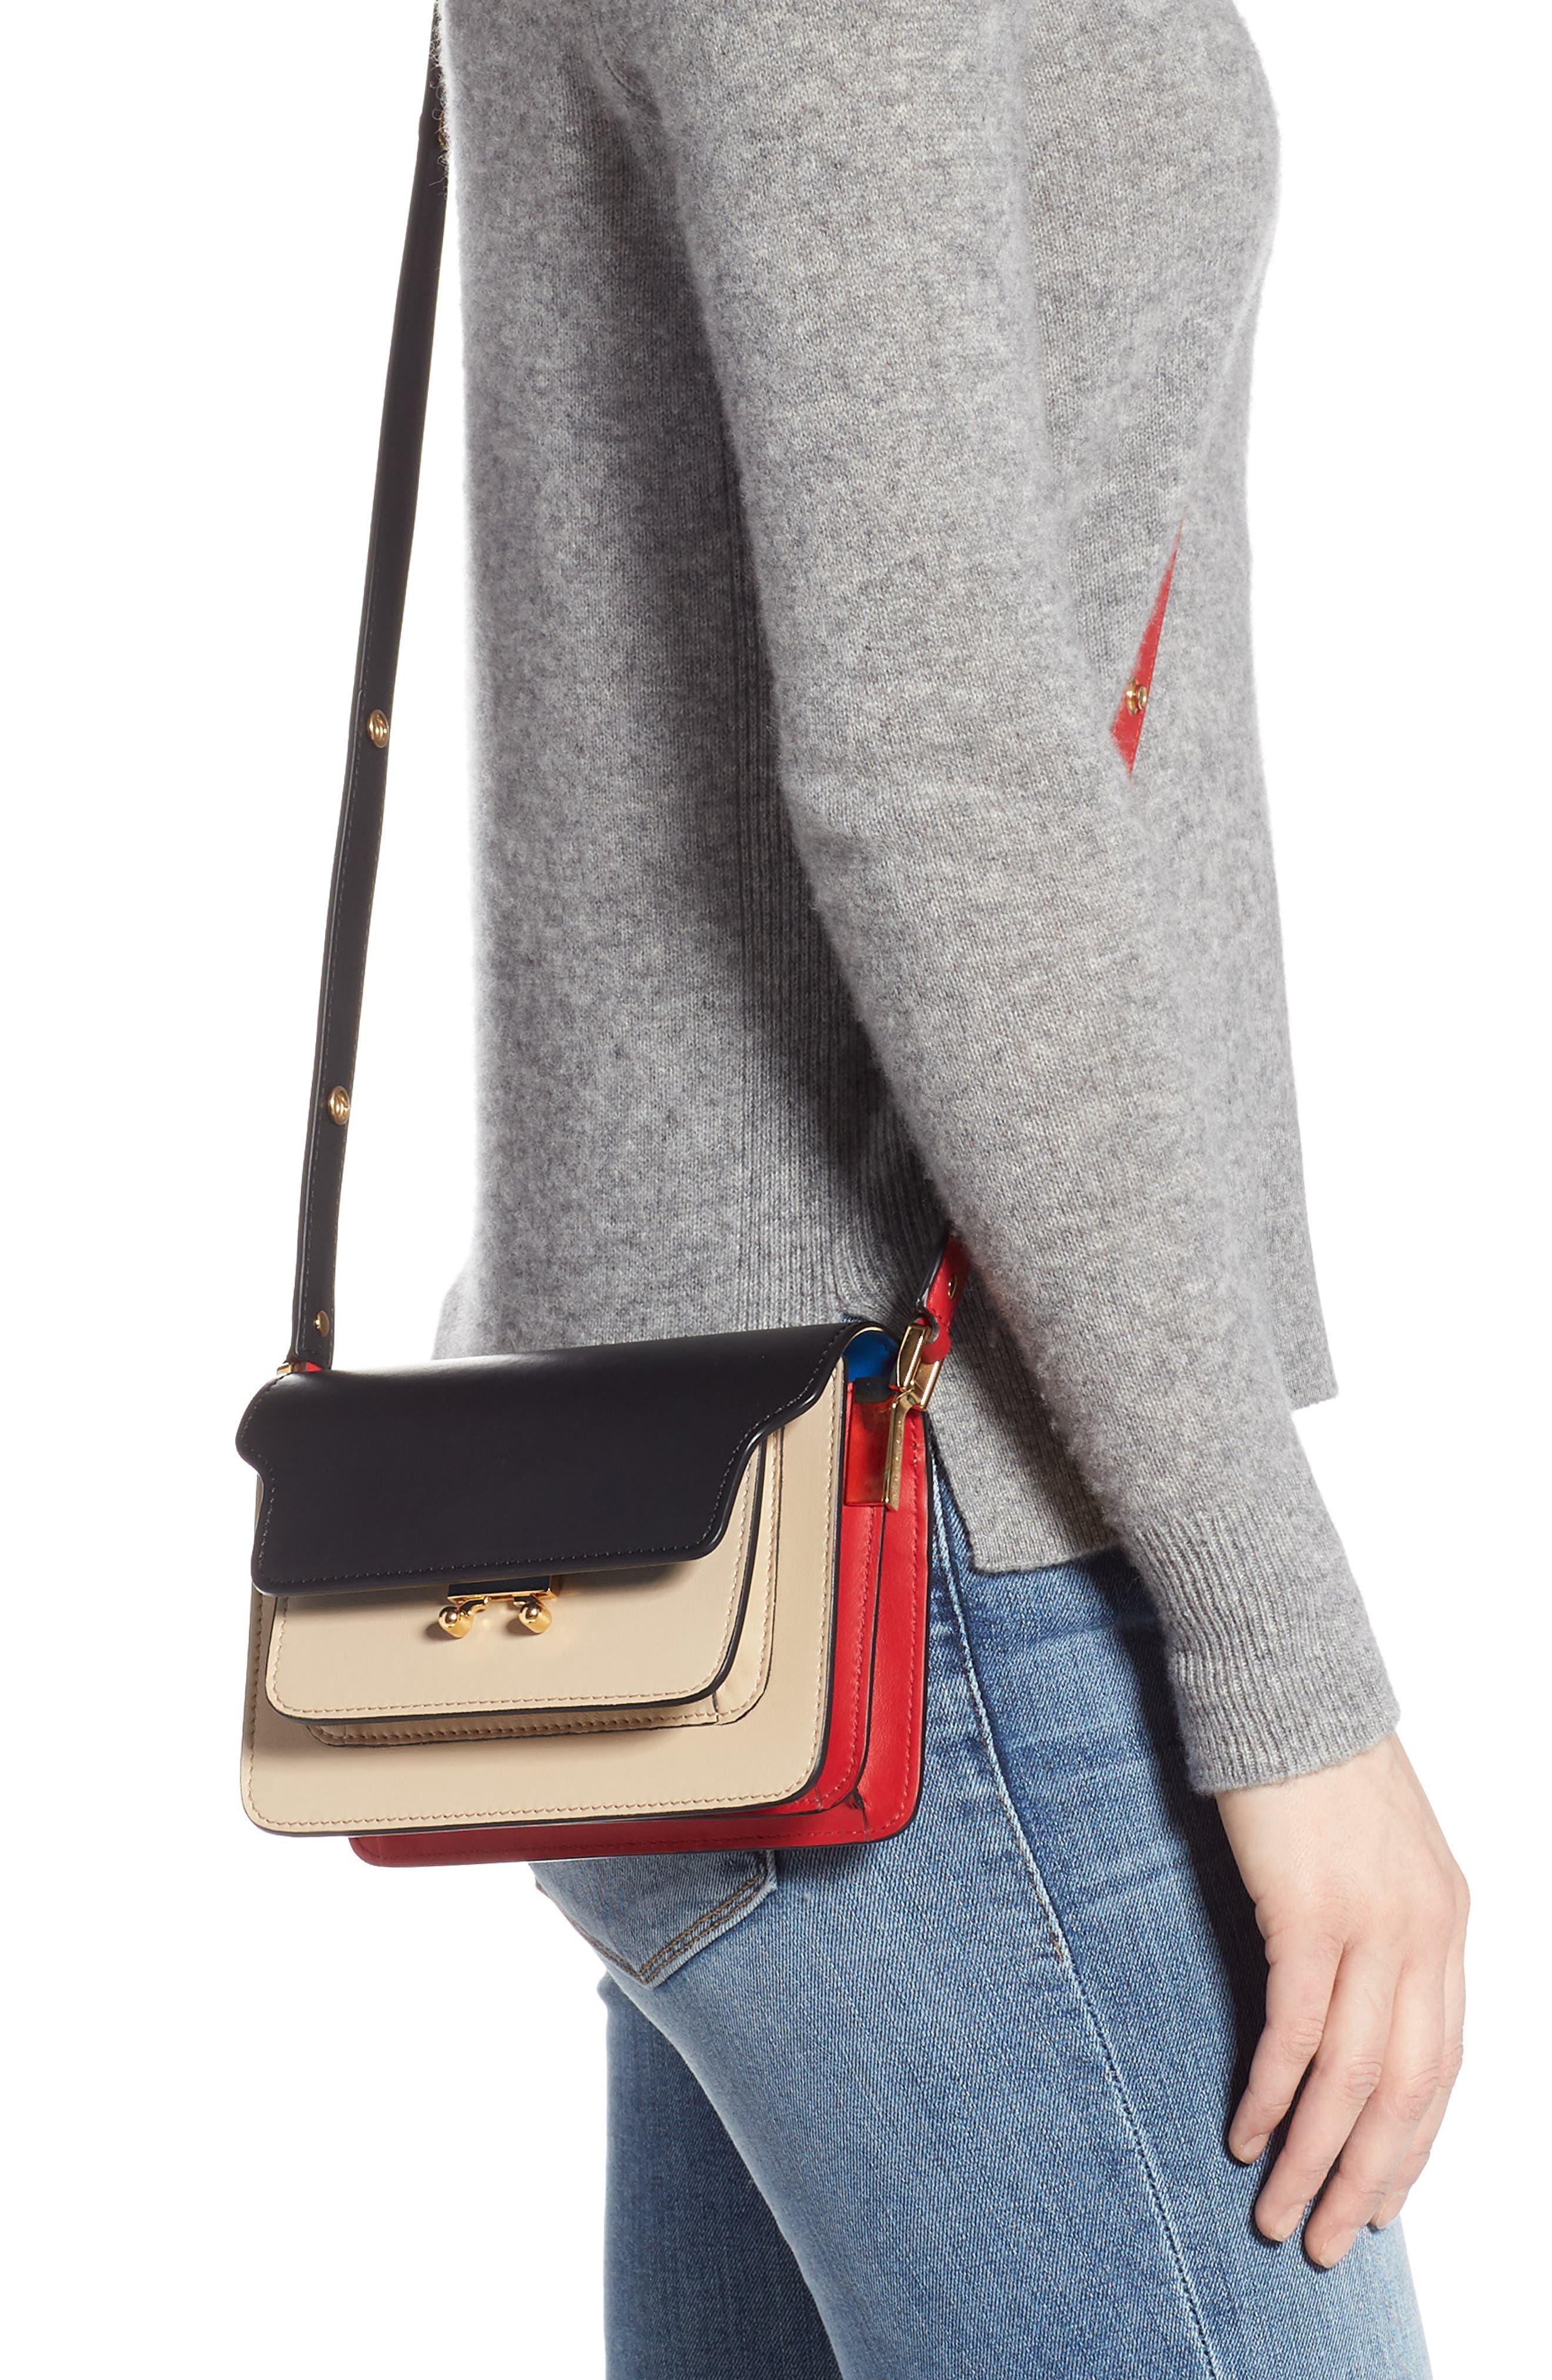 Small Trunk Colorblock Leather Shoulder Bag,                             Alternate thumbnail 2, color,                             LIGHT CAMEL/ BLACK/ RED